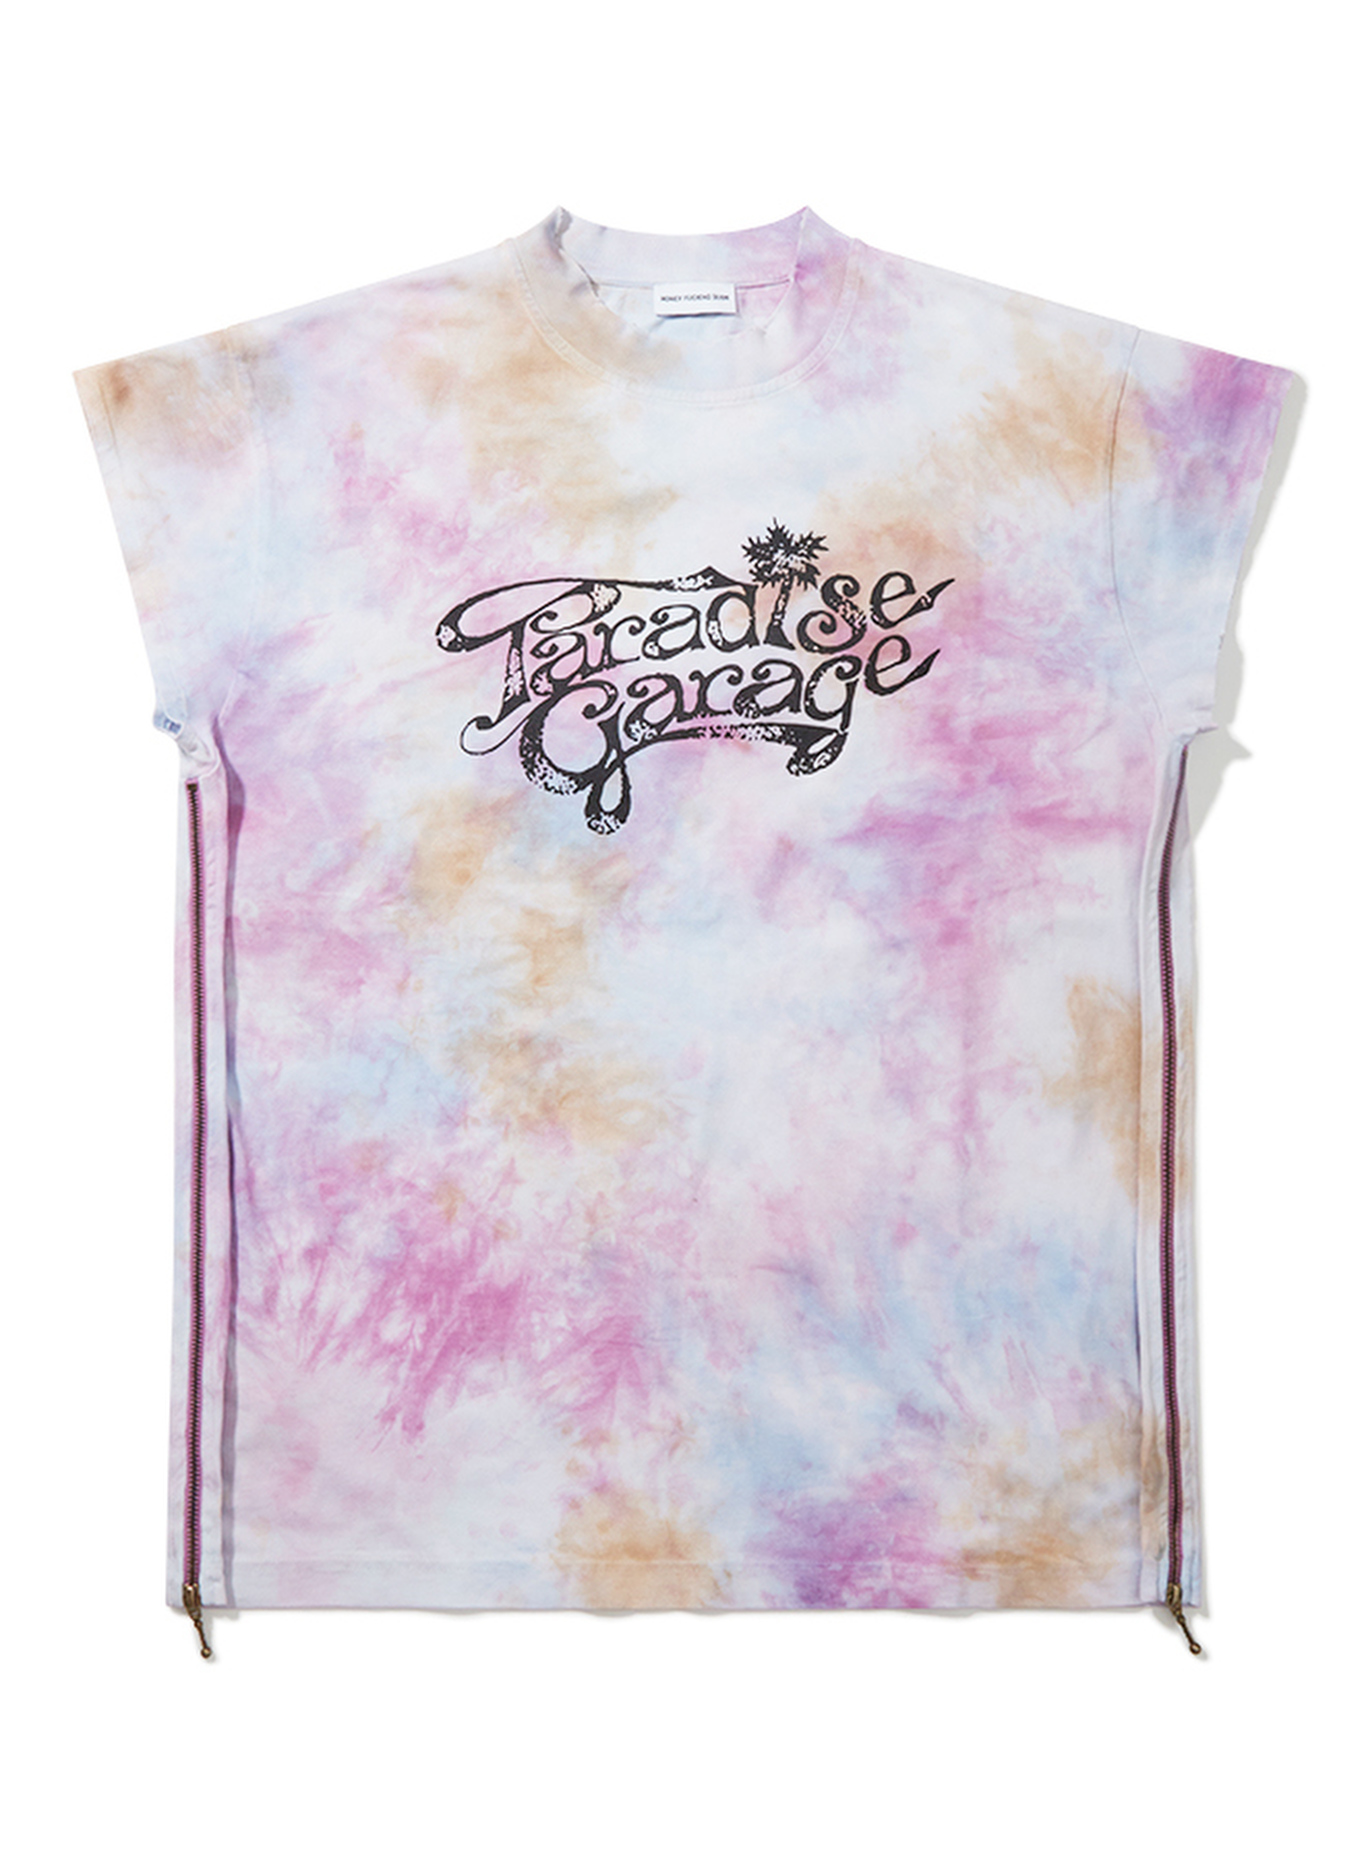 T-shirt by Honey Dijon